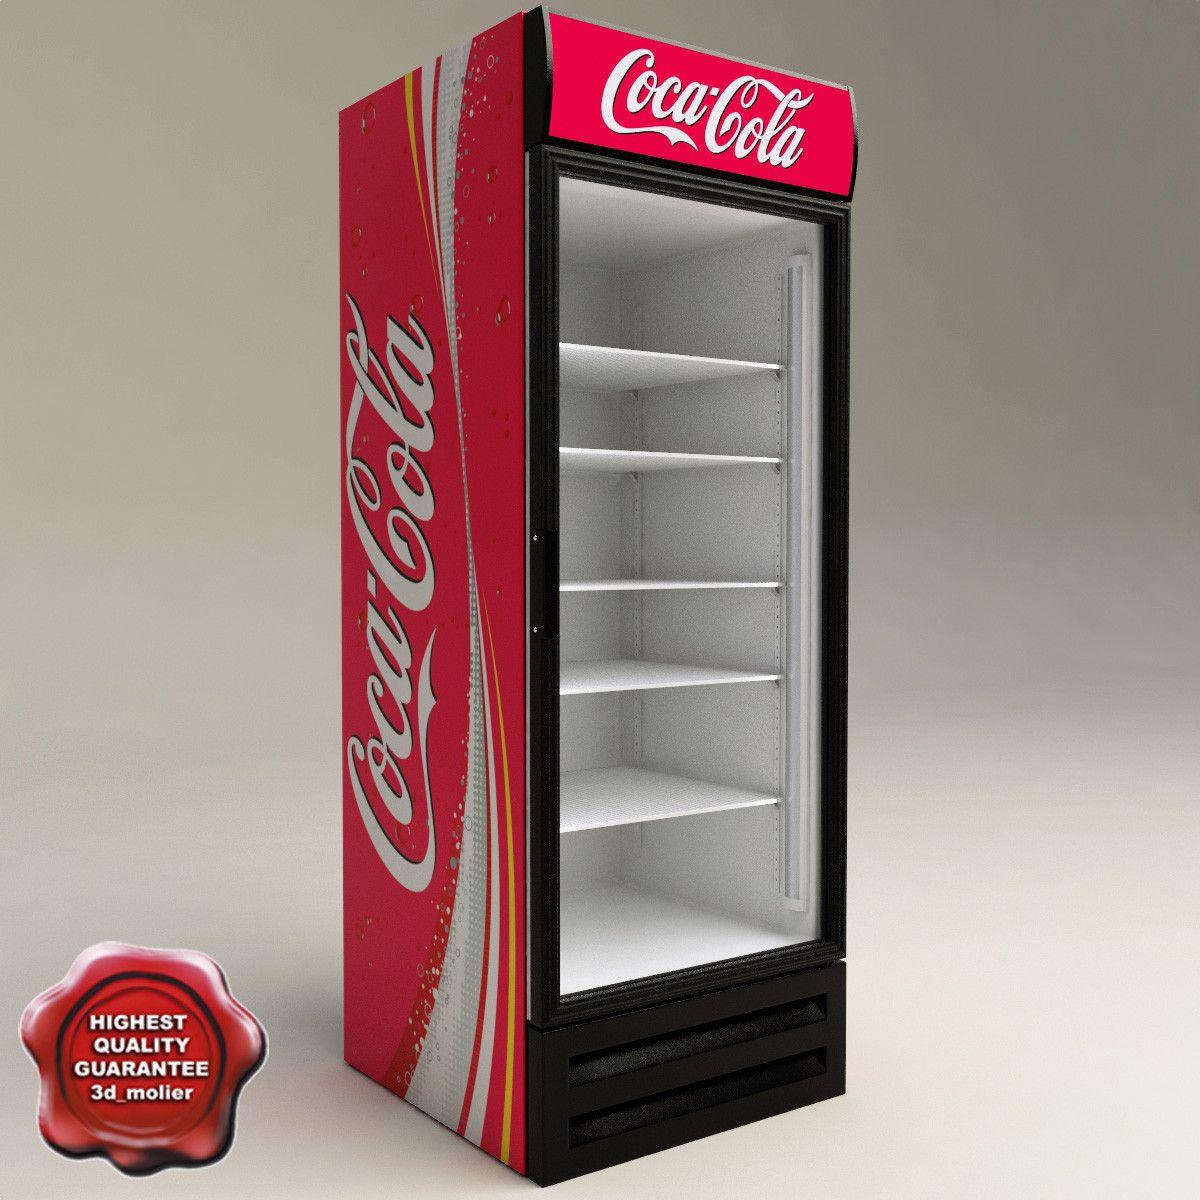 Pin By Robert Nowak On 3d Models Pinterest Refrigerator Coca